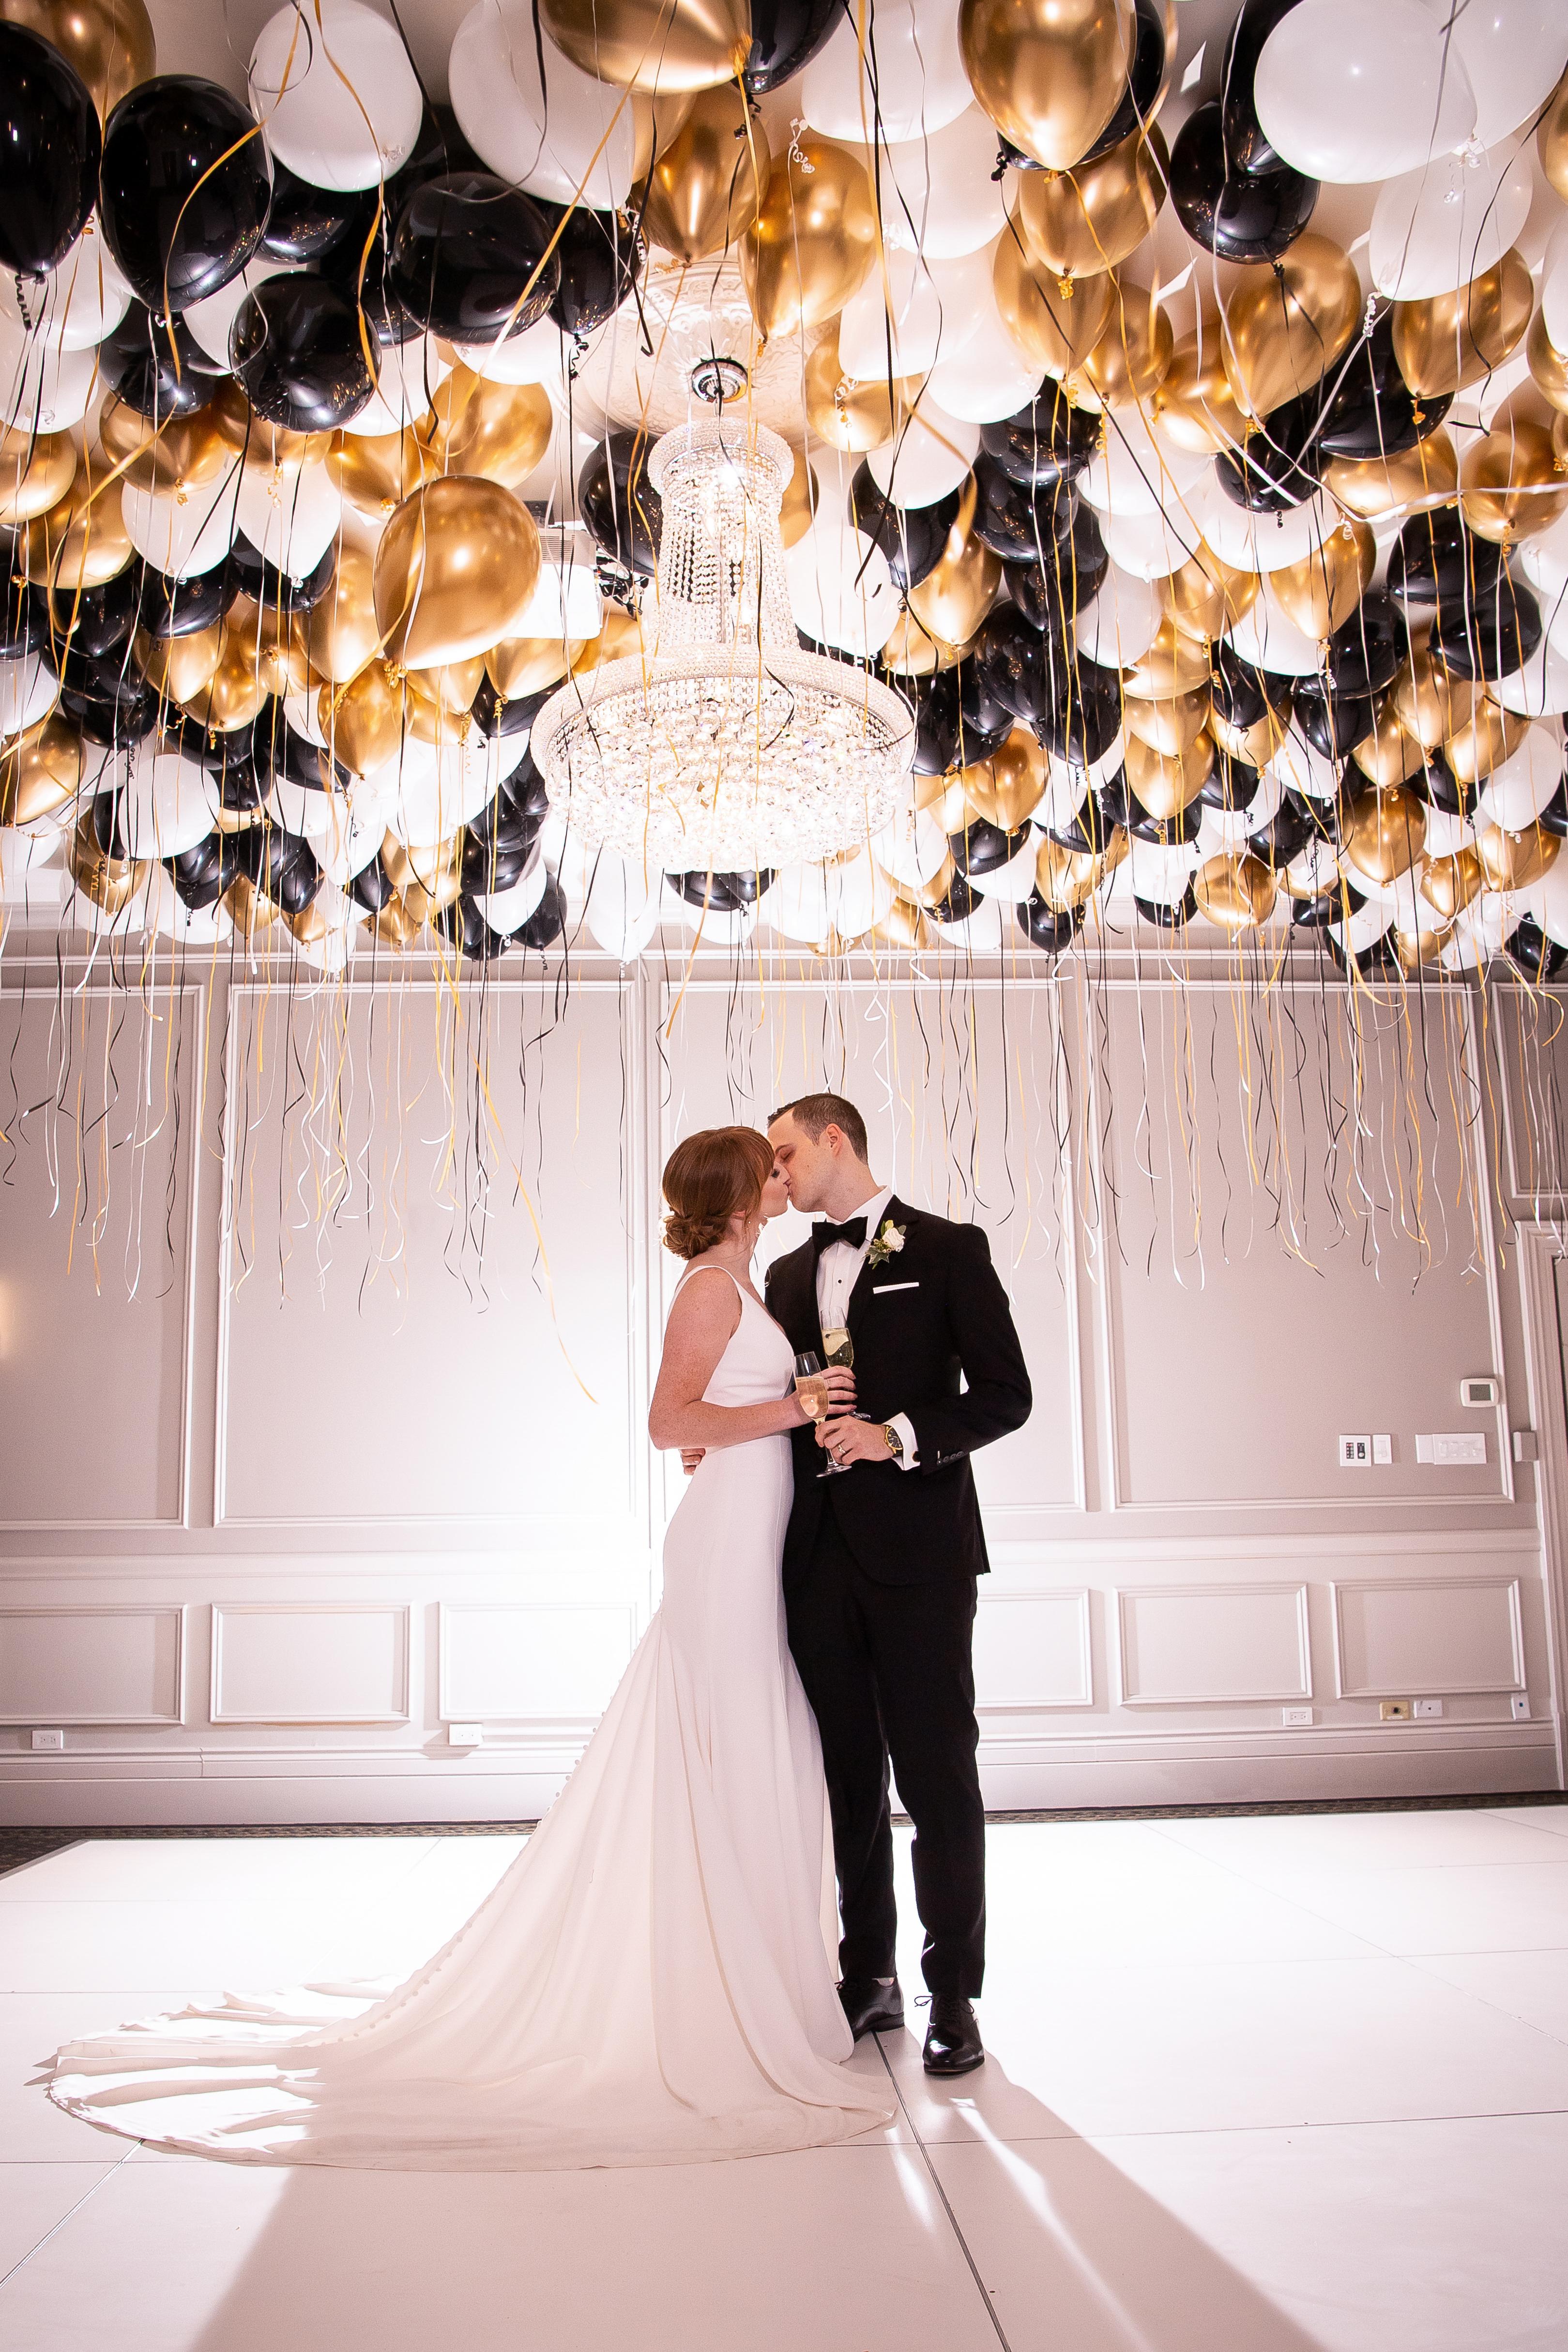 The London Club Ontario Wedding New Years